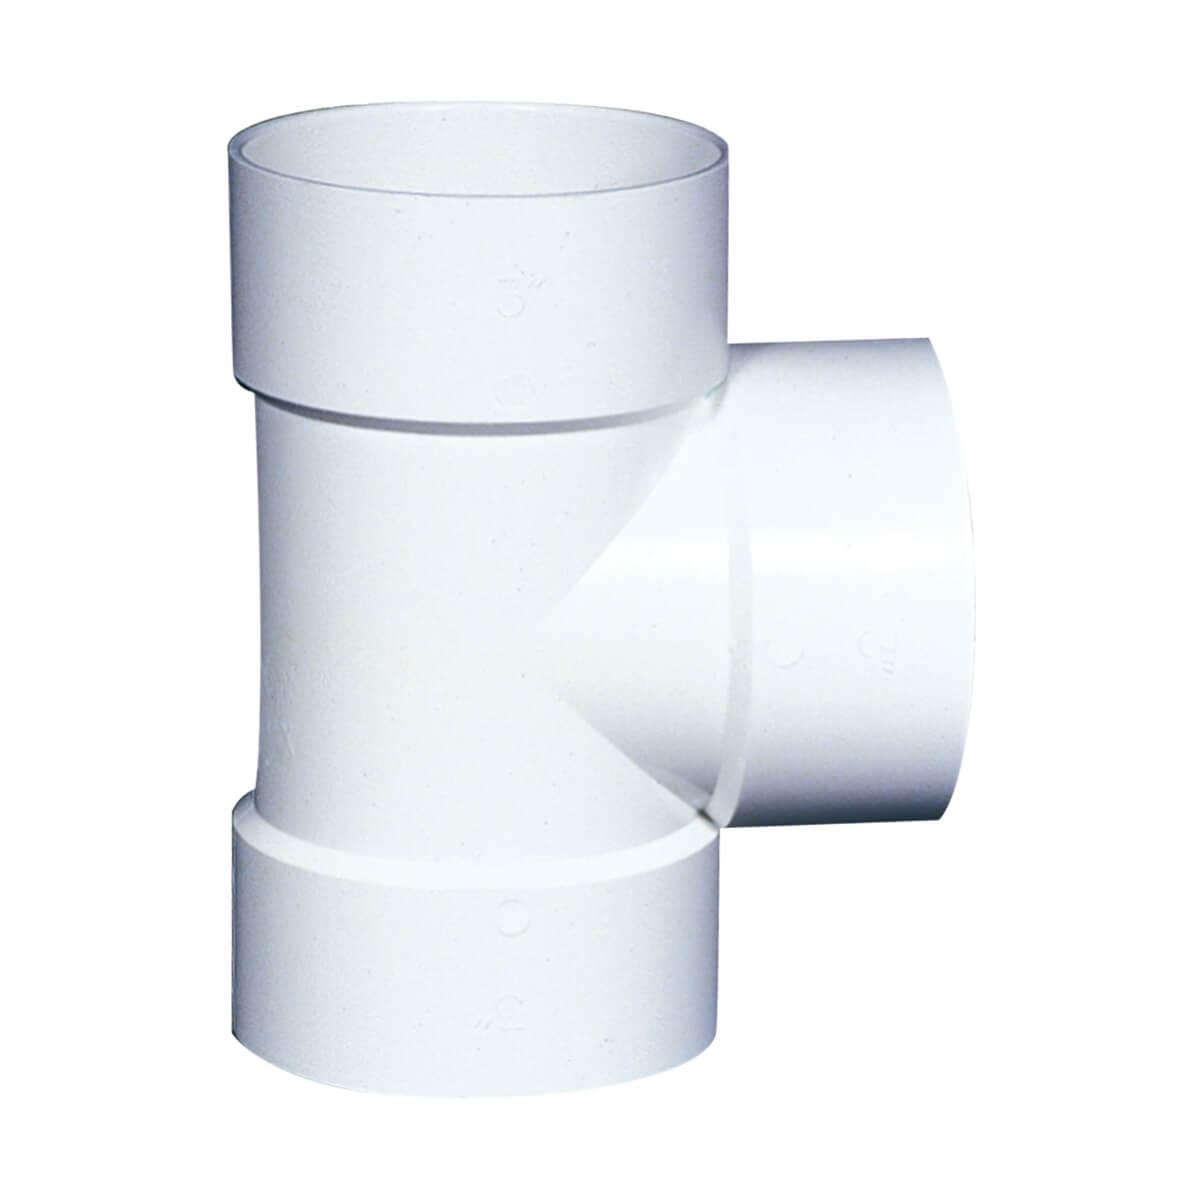 PVC-BDS Straight Tee - Hub - 3-in